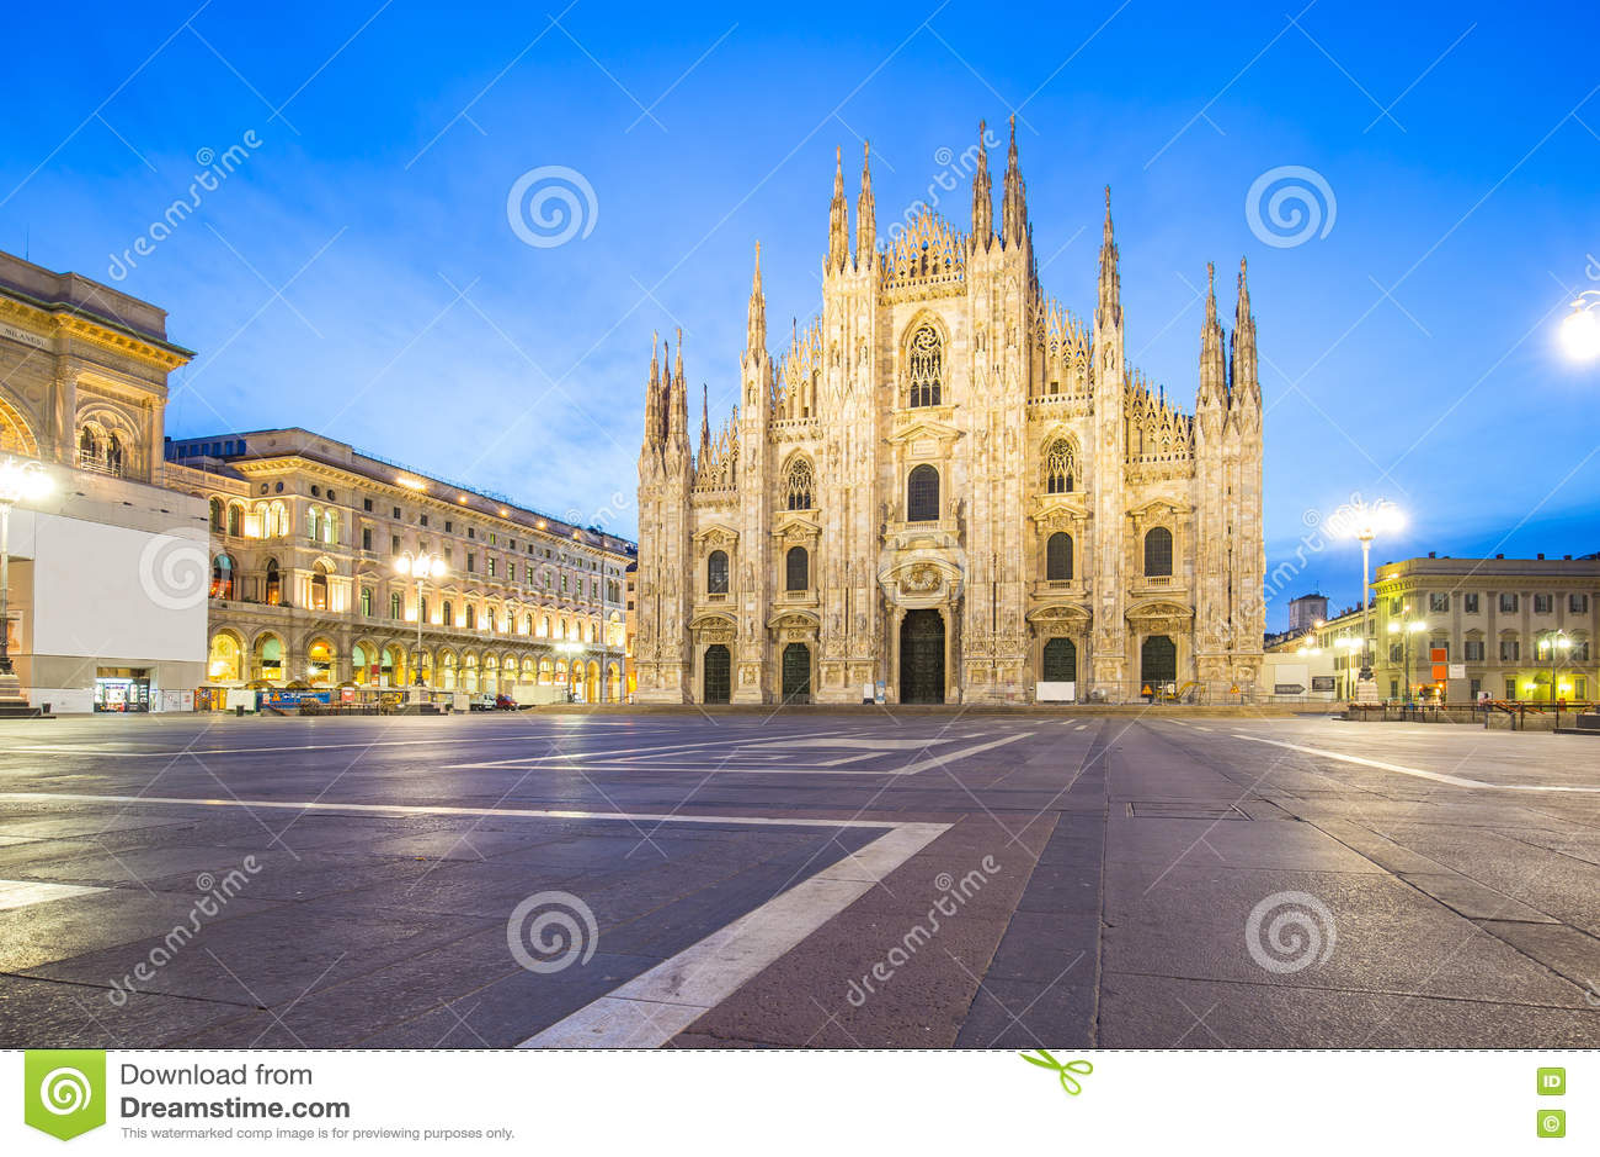 Le Duomo de Milan Cathedral à Milan, Italie